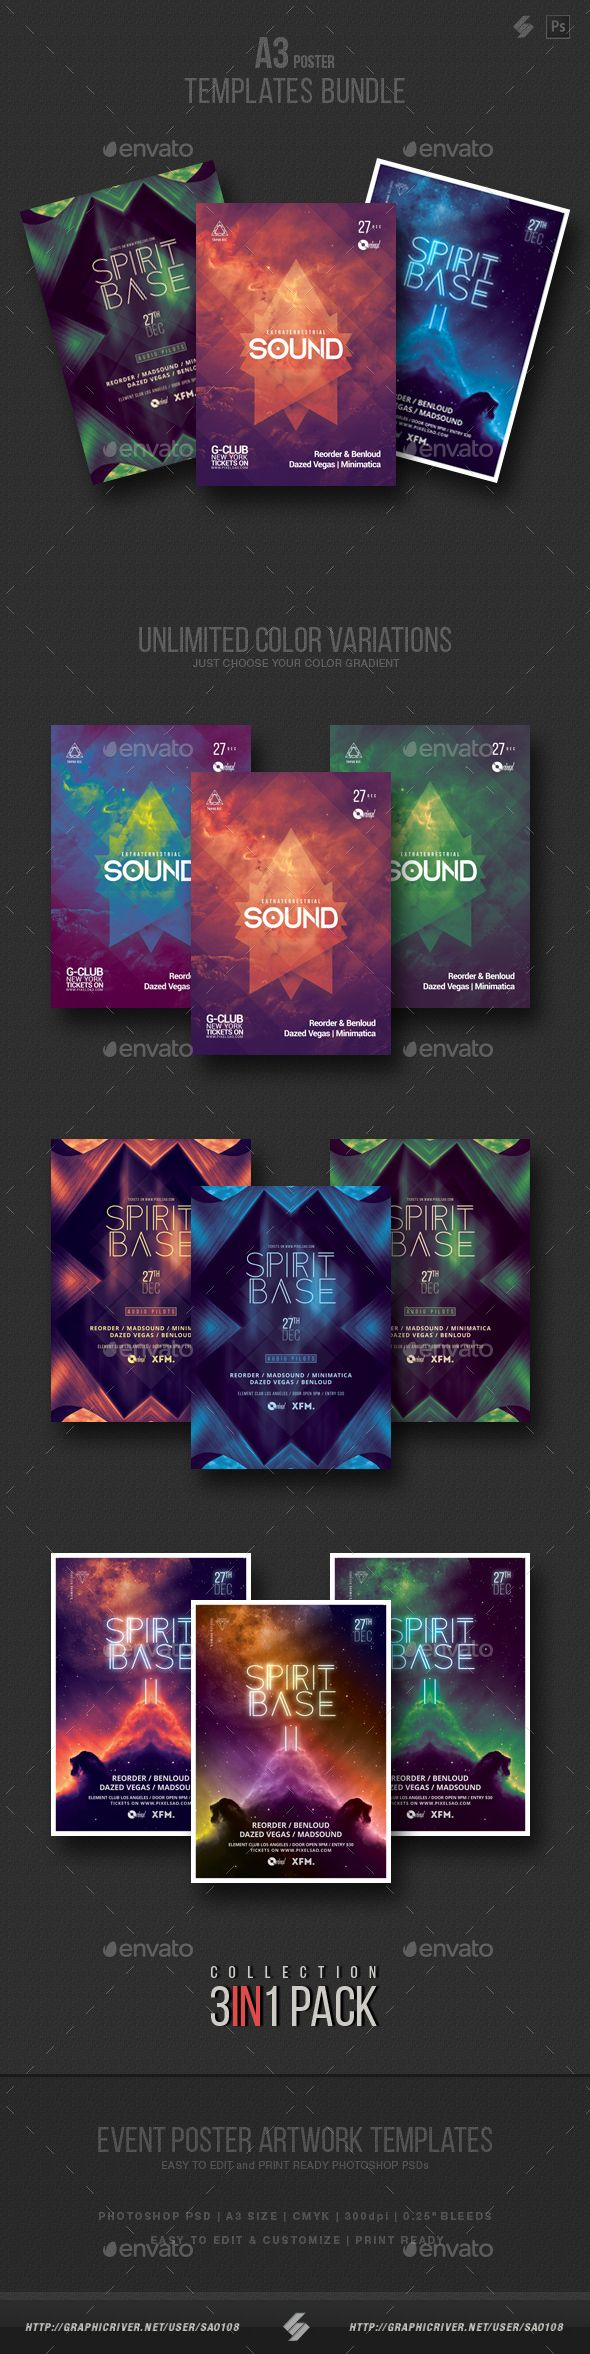 Progressive Sound vol.5 - Party Flyer / Poster Templates Bundle. Download: https://graphicriver.net/item/progressive-sound-vol5-party-flyer-poster-templates-bundle/19277666?ref=thanhdesign